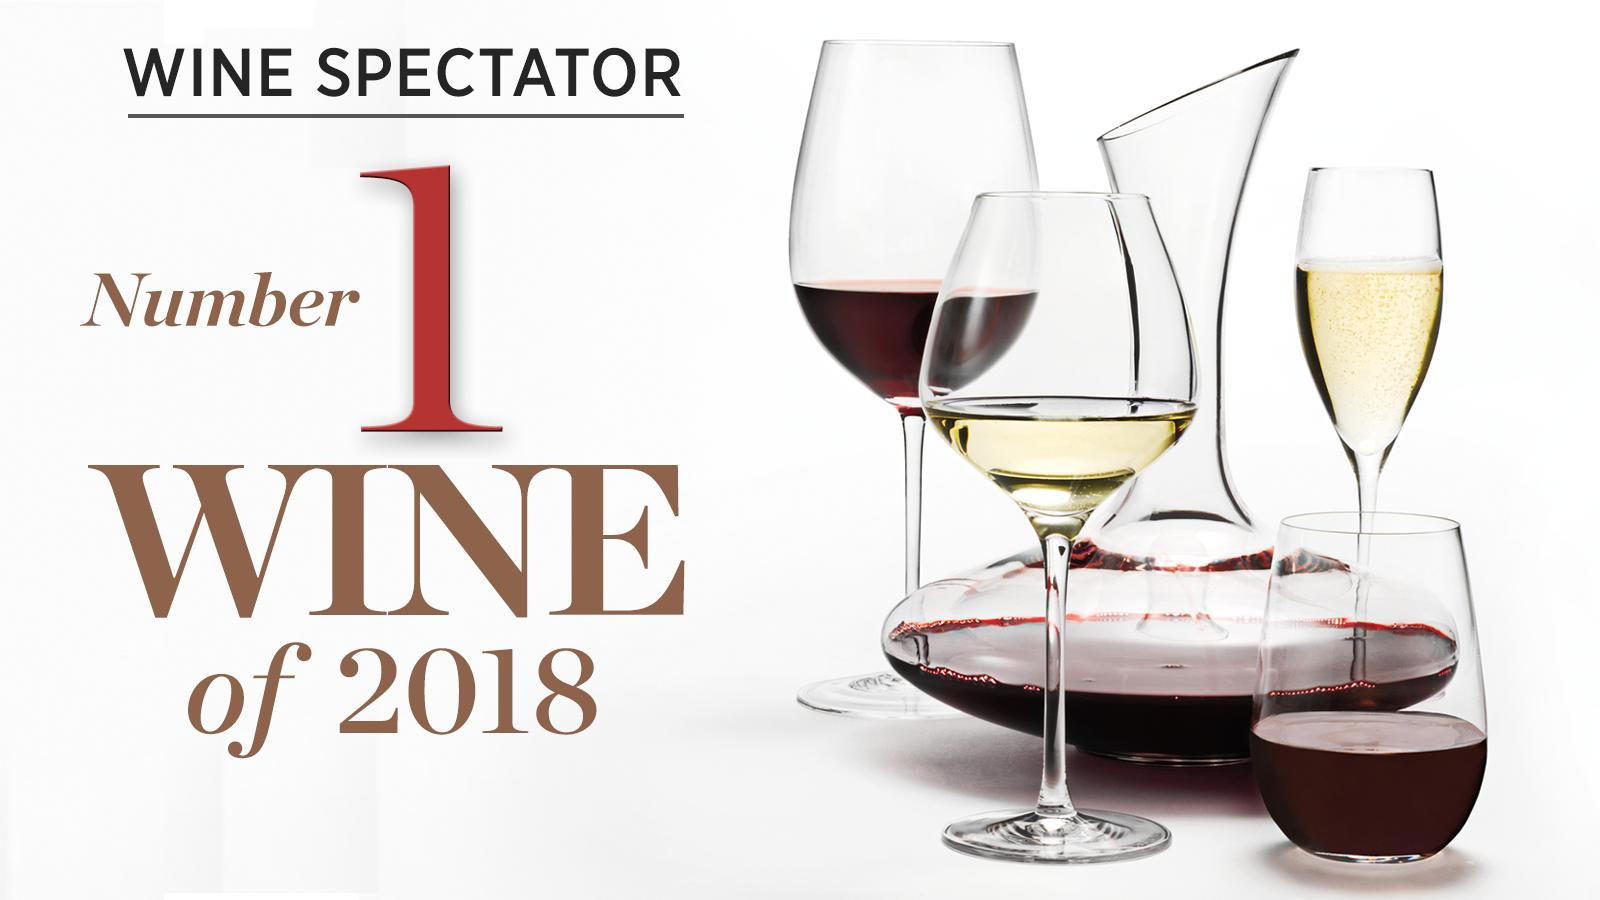 winespectator.com - Wine No. 1 in Wine Spectator's Top 100 of 2018